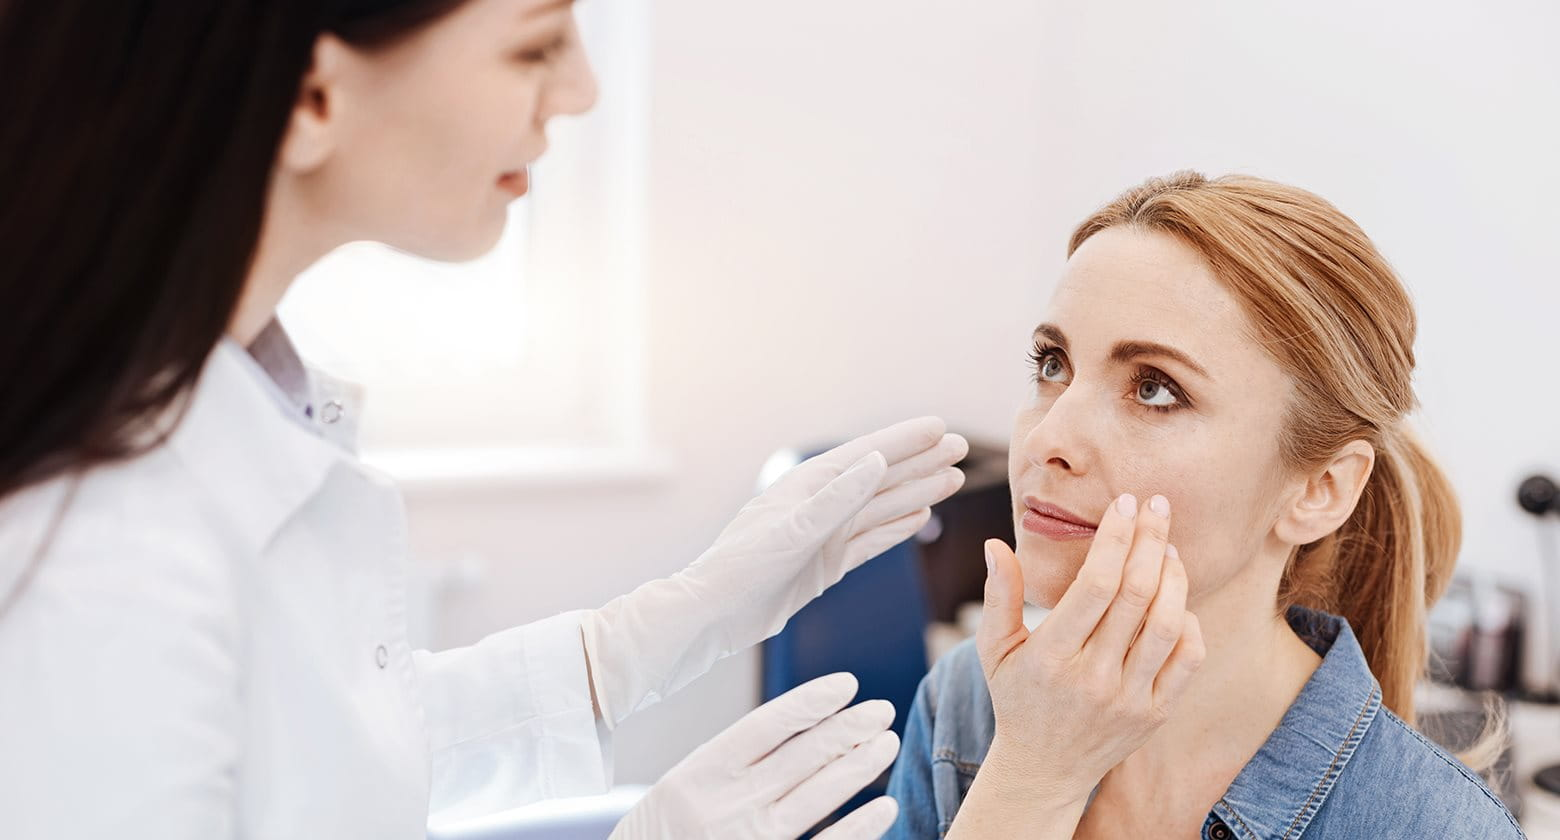 Acne doctor examining skin